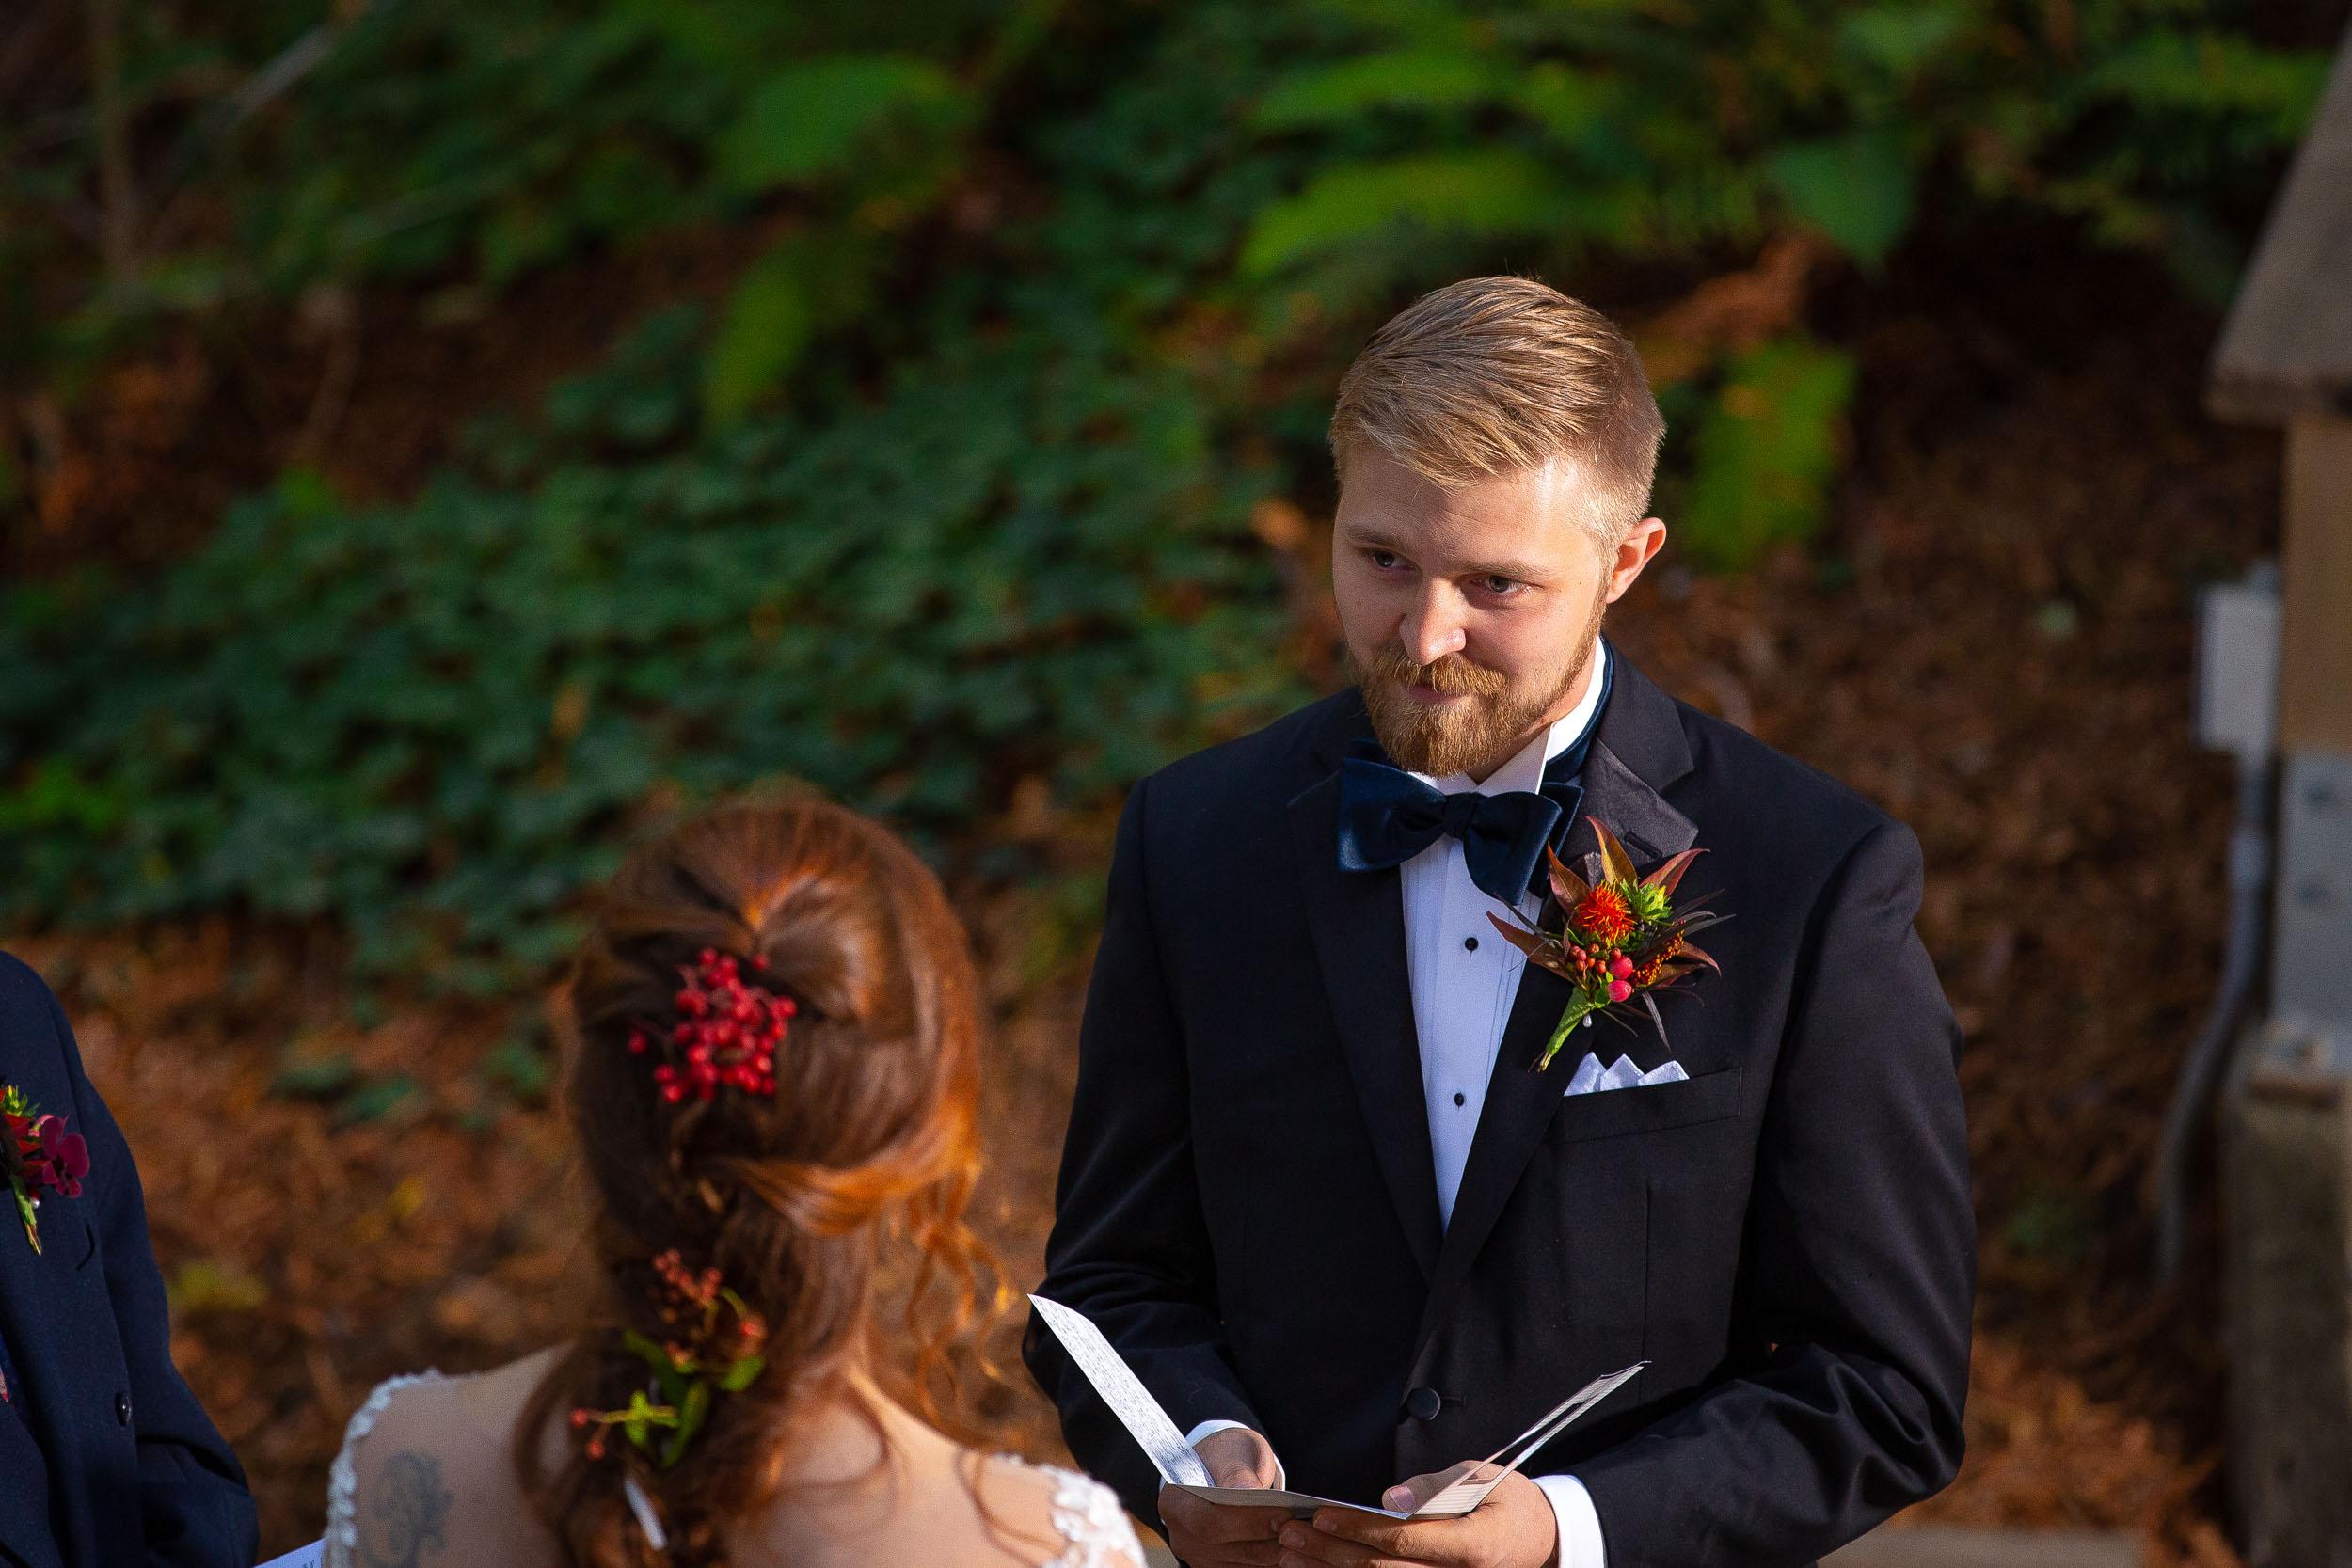 Berkeley Botanical Garden Wedding Ceremony in the Redwood Grove Ceremony and SF Bay Wedding Cruise Reception-40.jpg